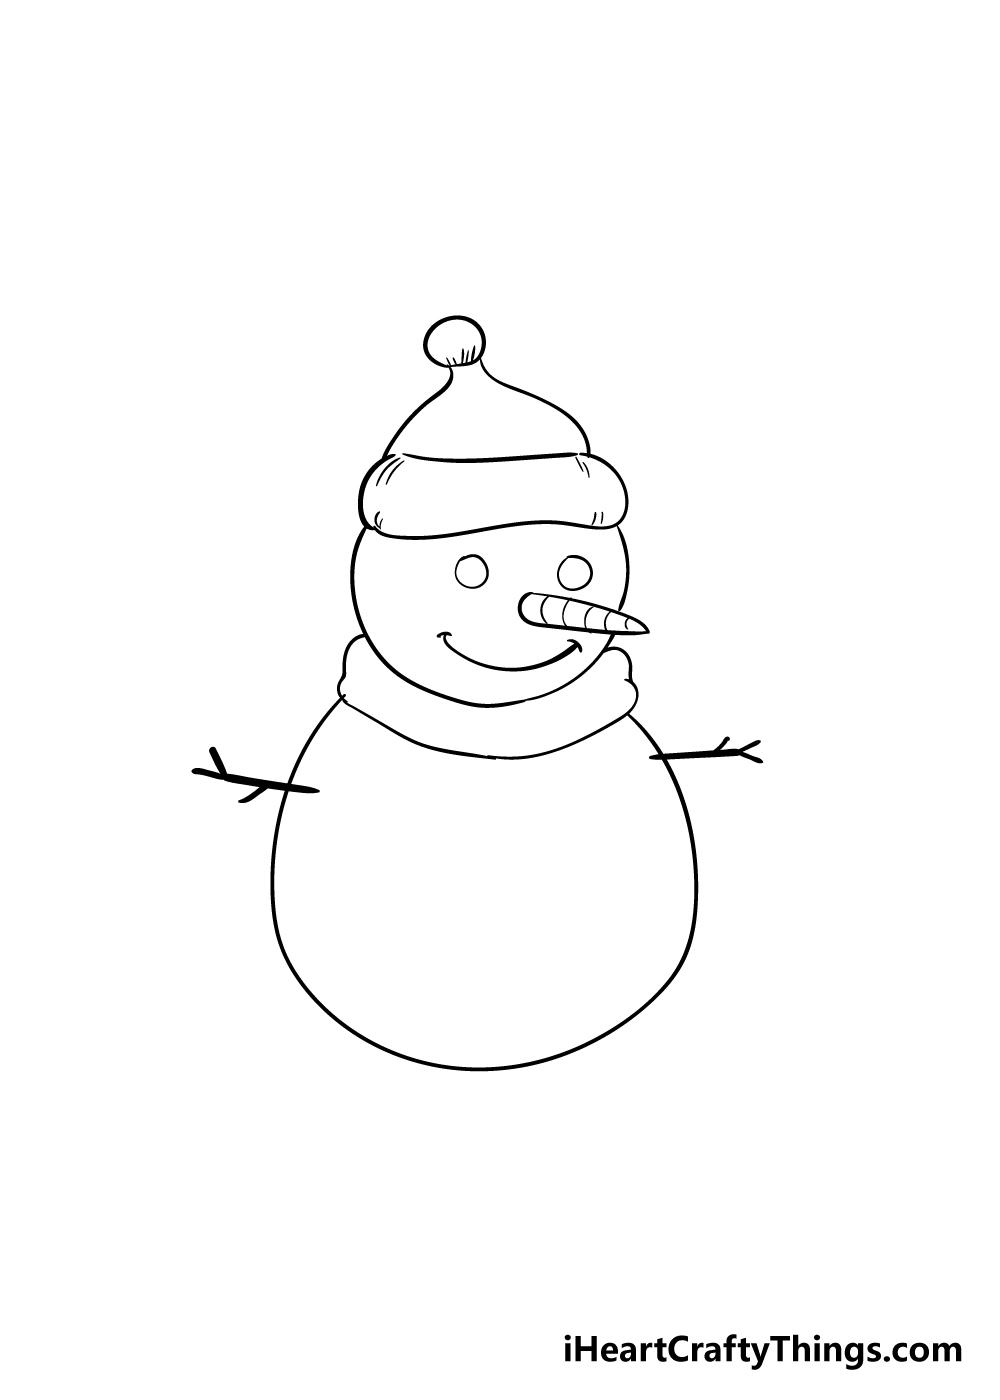 snowman drawing step 5